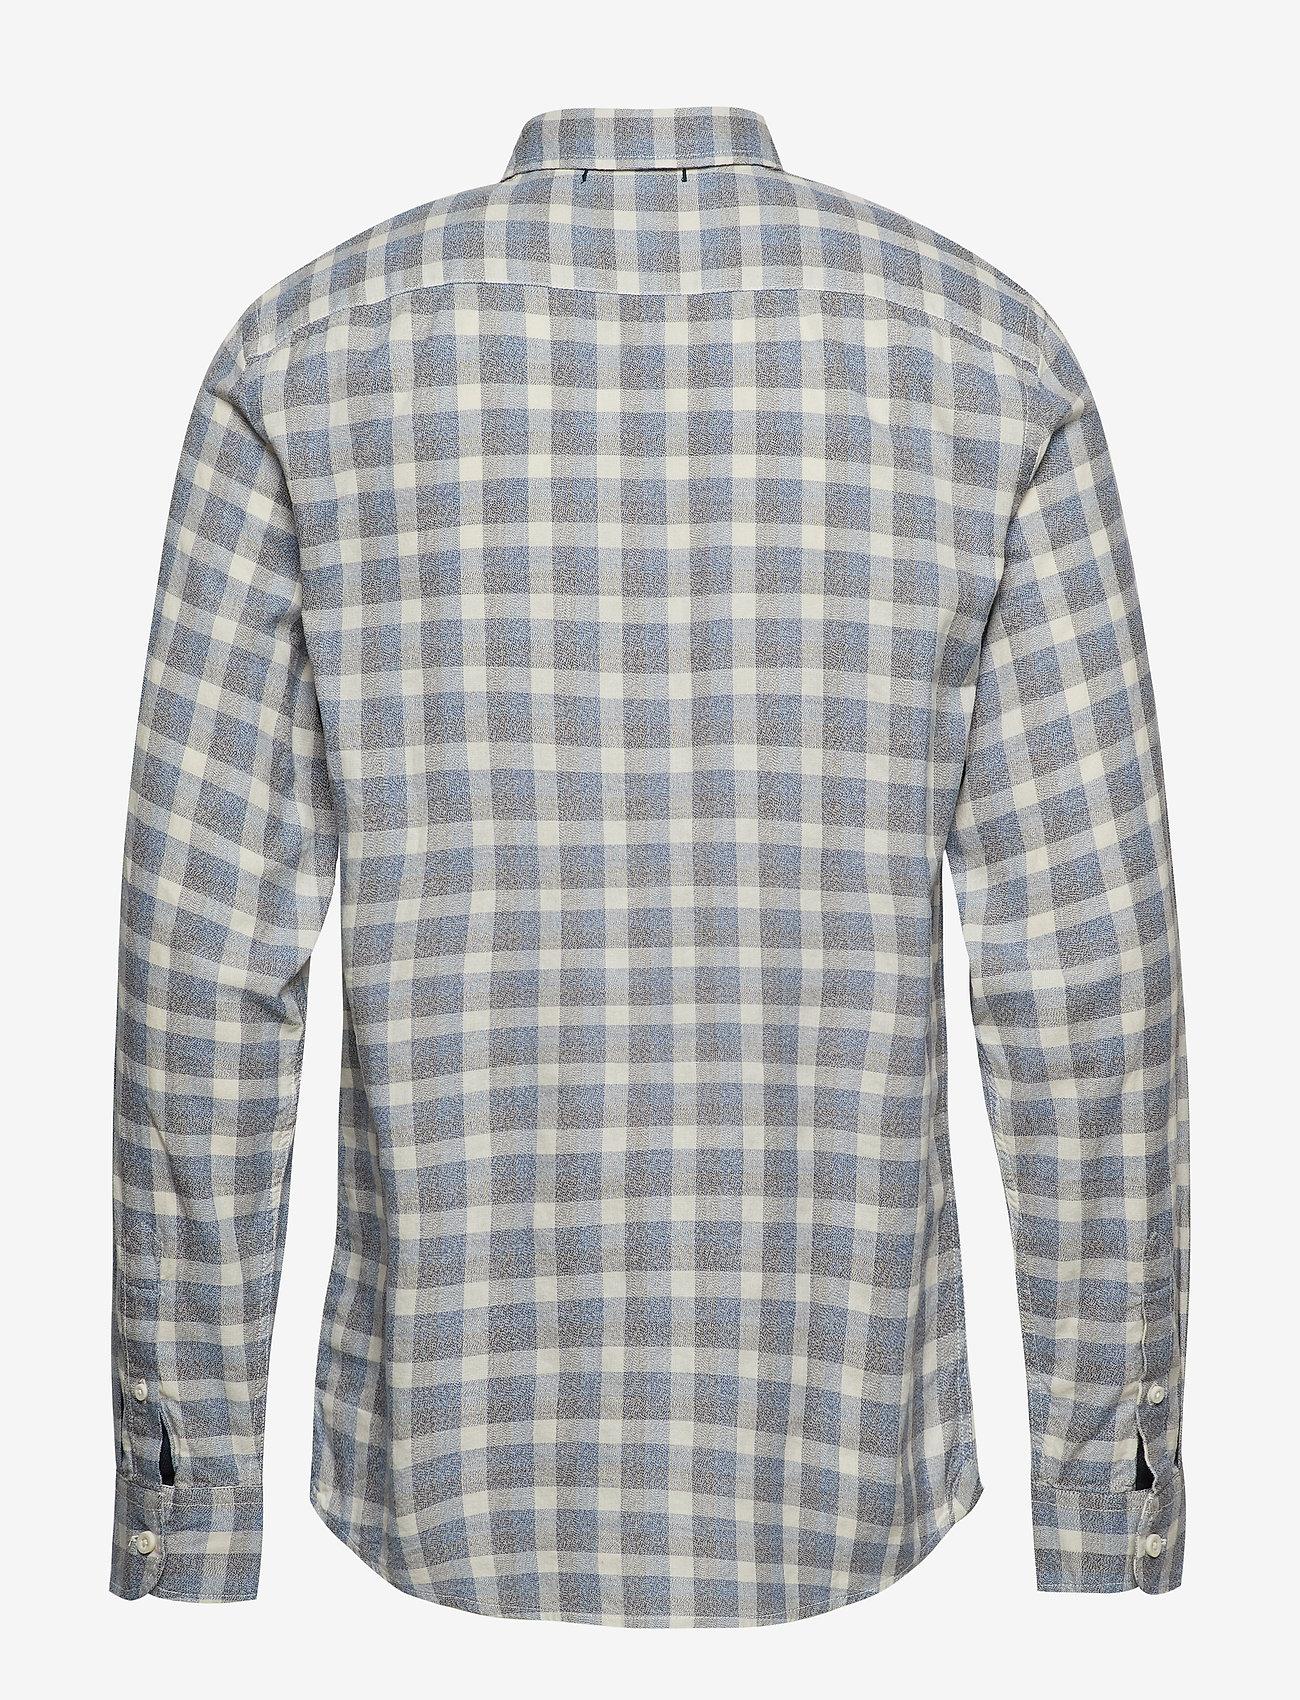 Dockers - SF ALPHA ICON SHIRT BROYLES IC - geruite overhemden - blues - 1